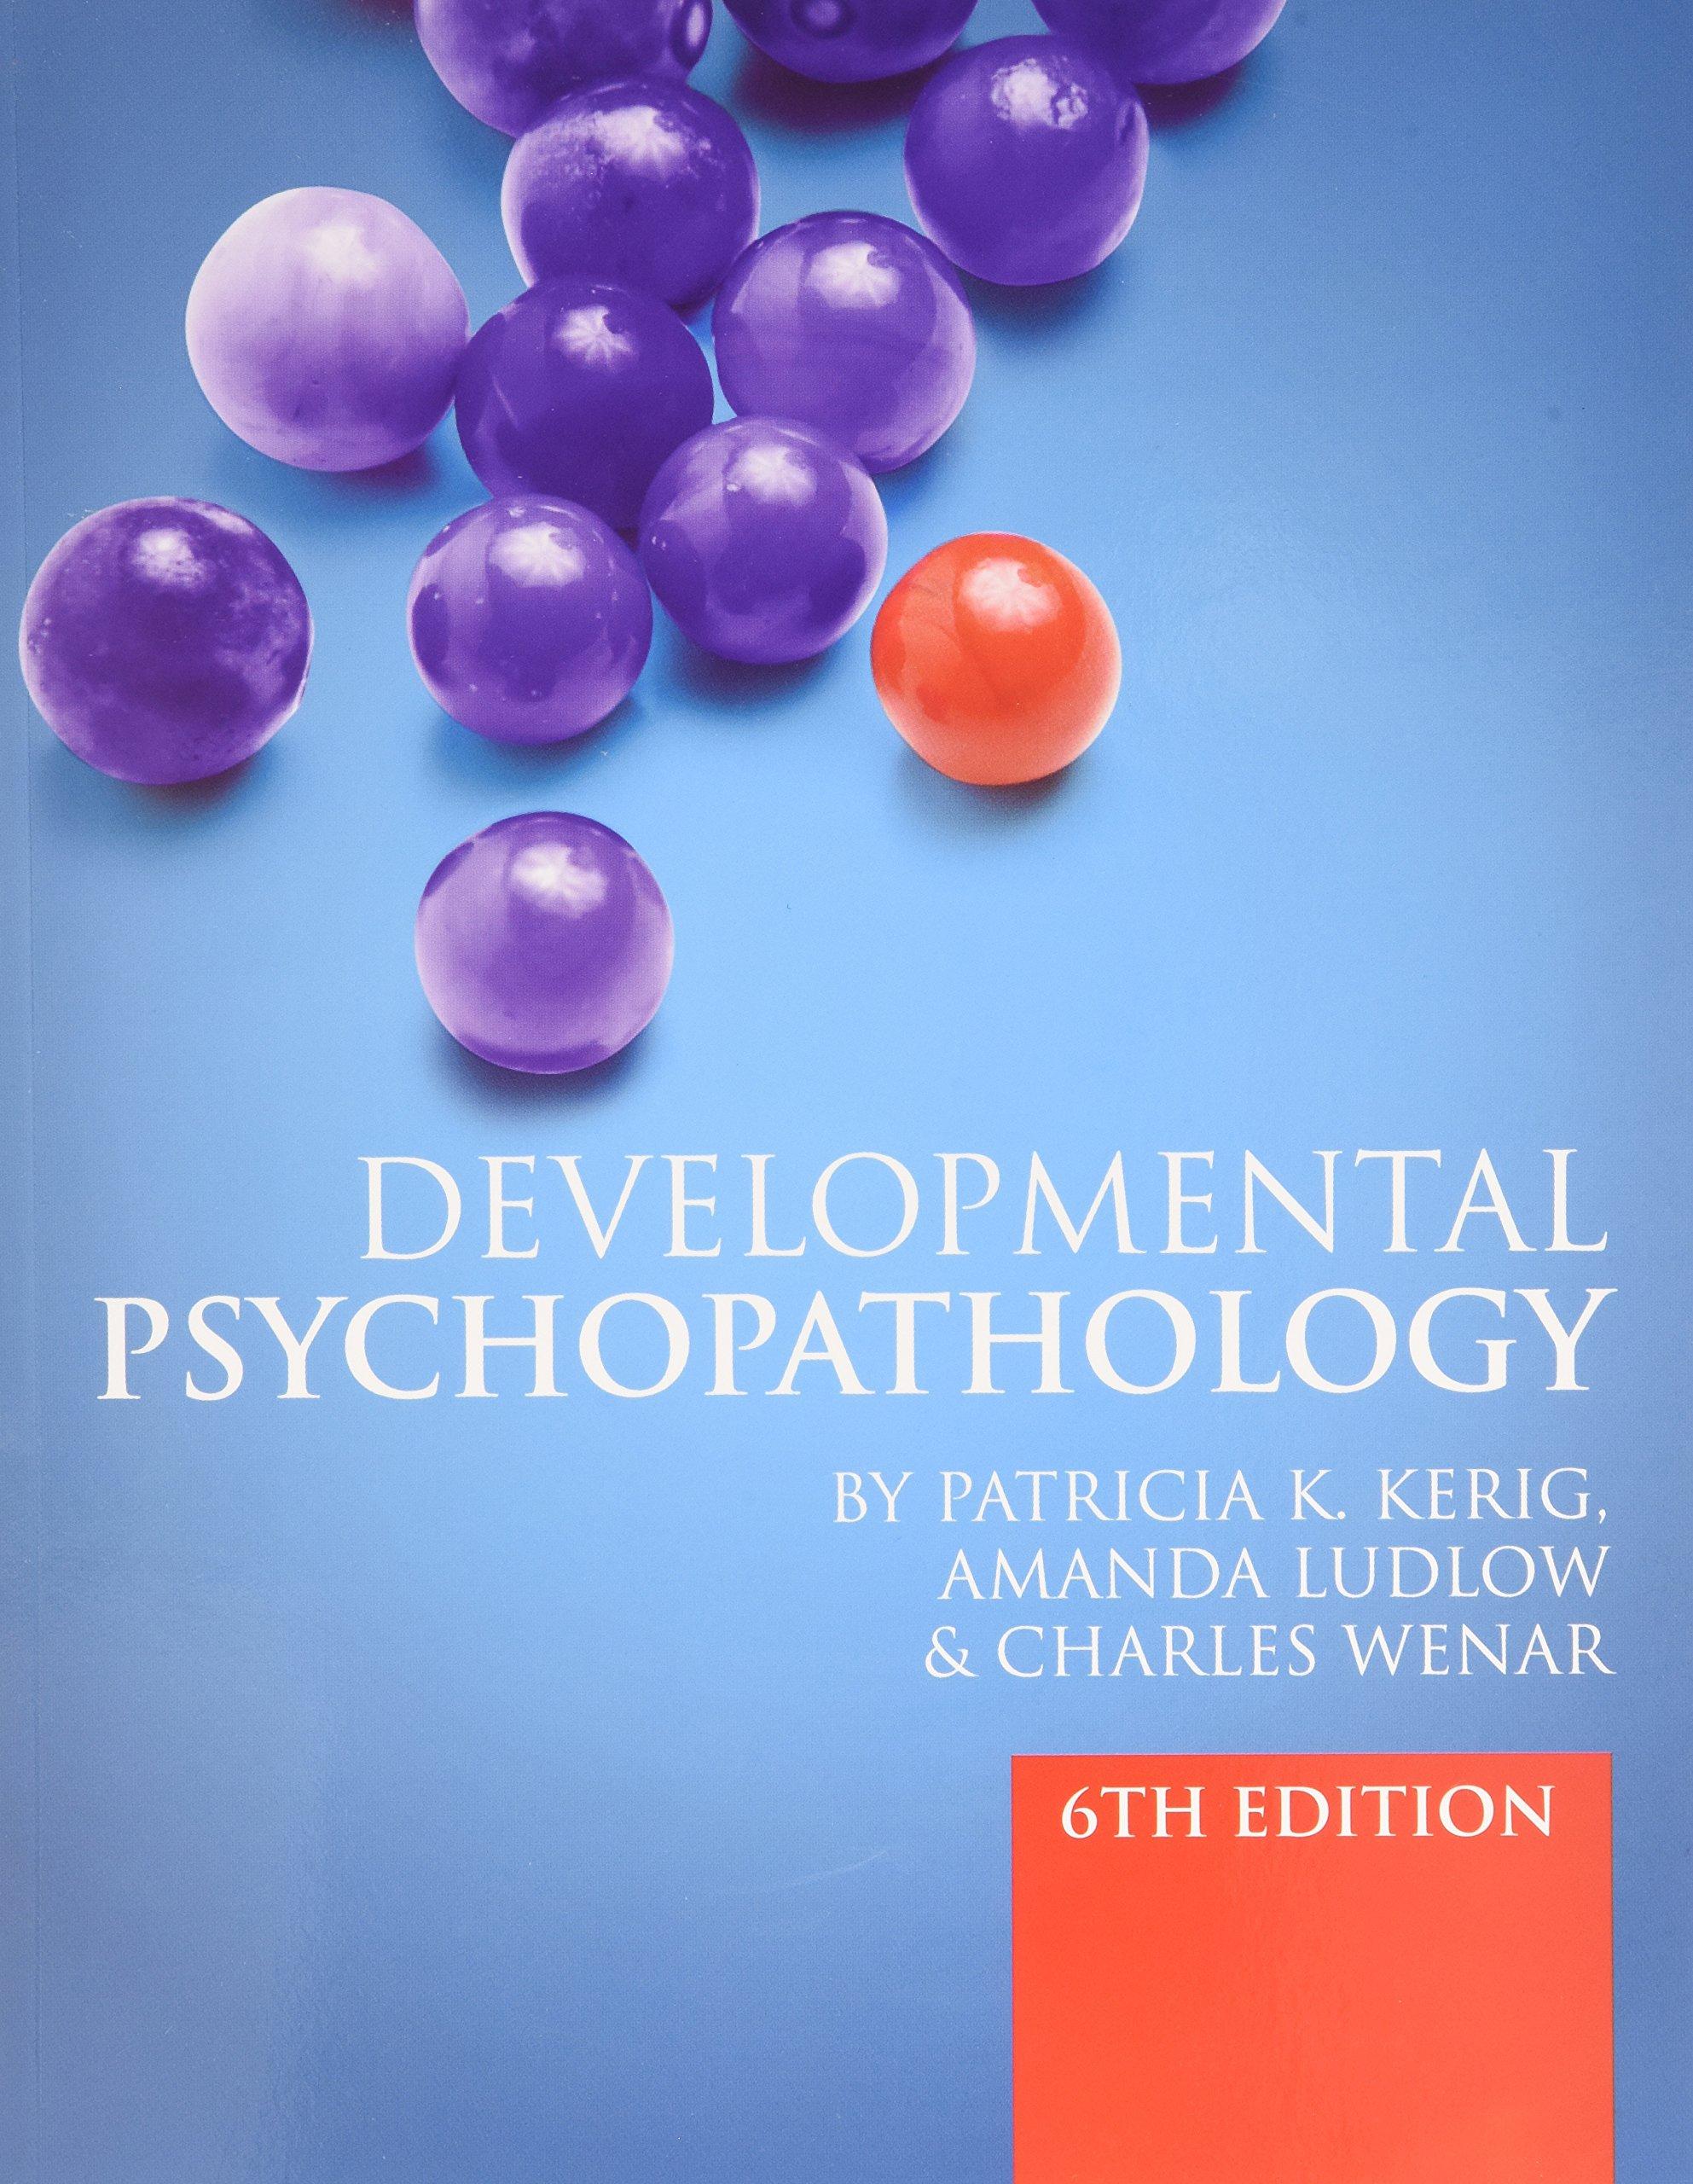 Download SW: Developmental Psychopathology: From Infancy Through Adolescence with Dsm-5 Update Supplement (UK Higher Education Psychology) pdf